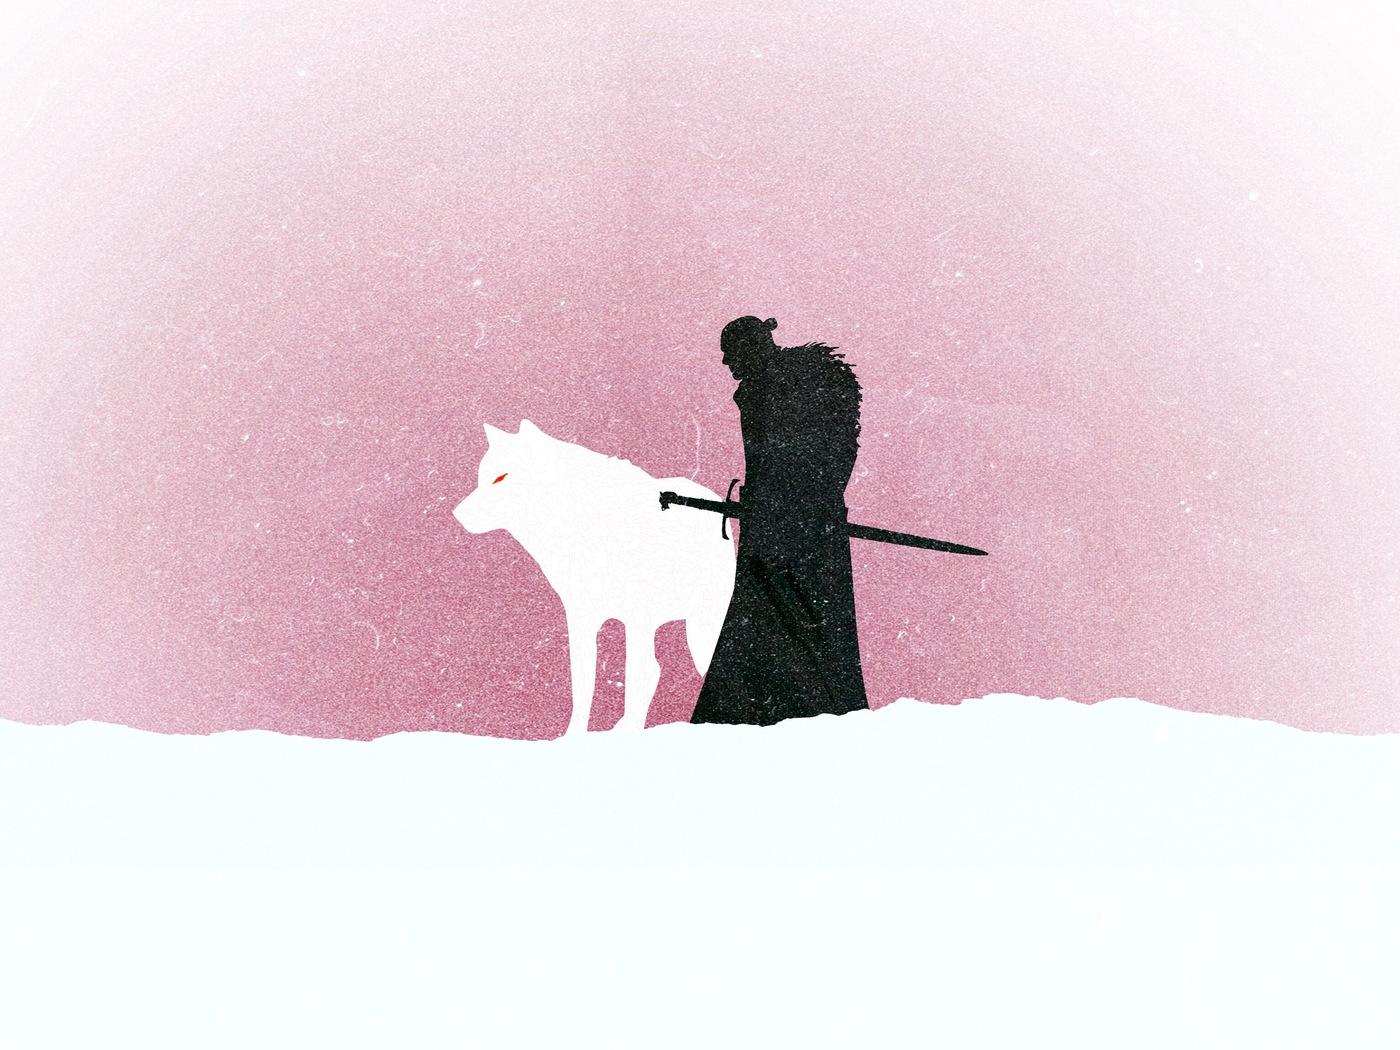 jon-snow-game-of-thrones-minimalism-b1.jpg